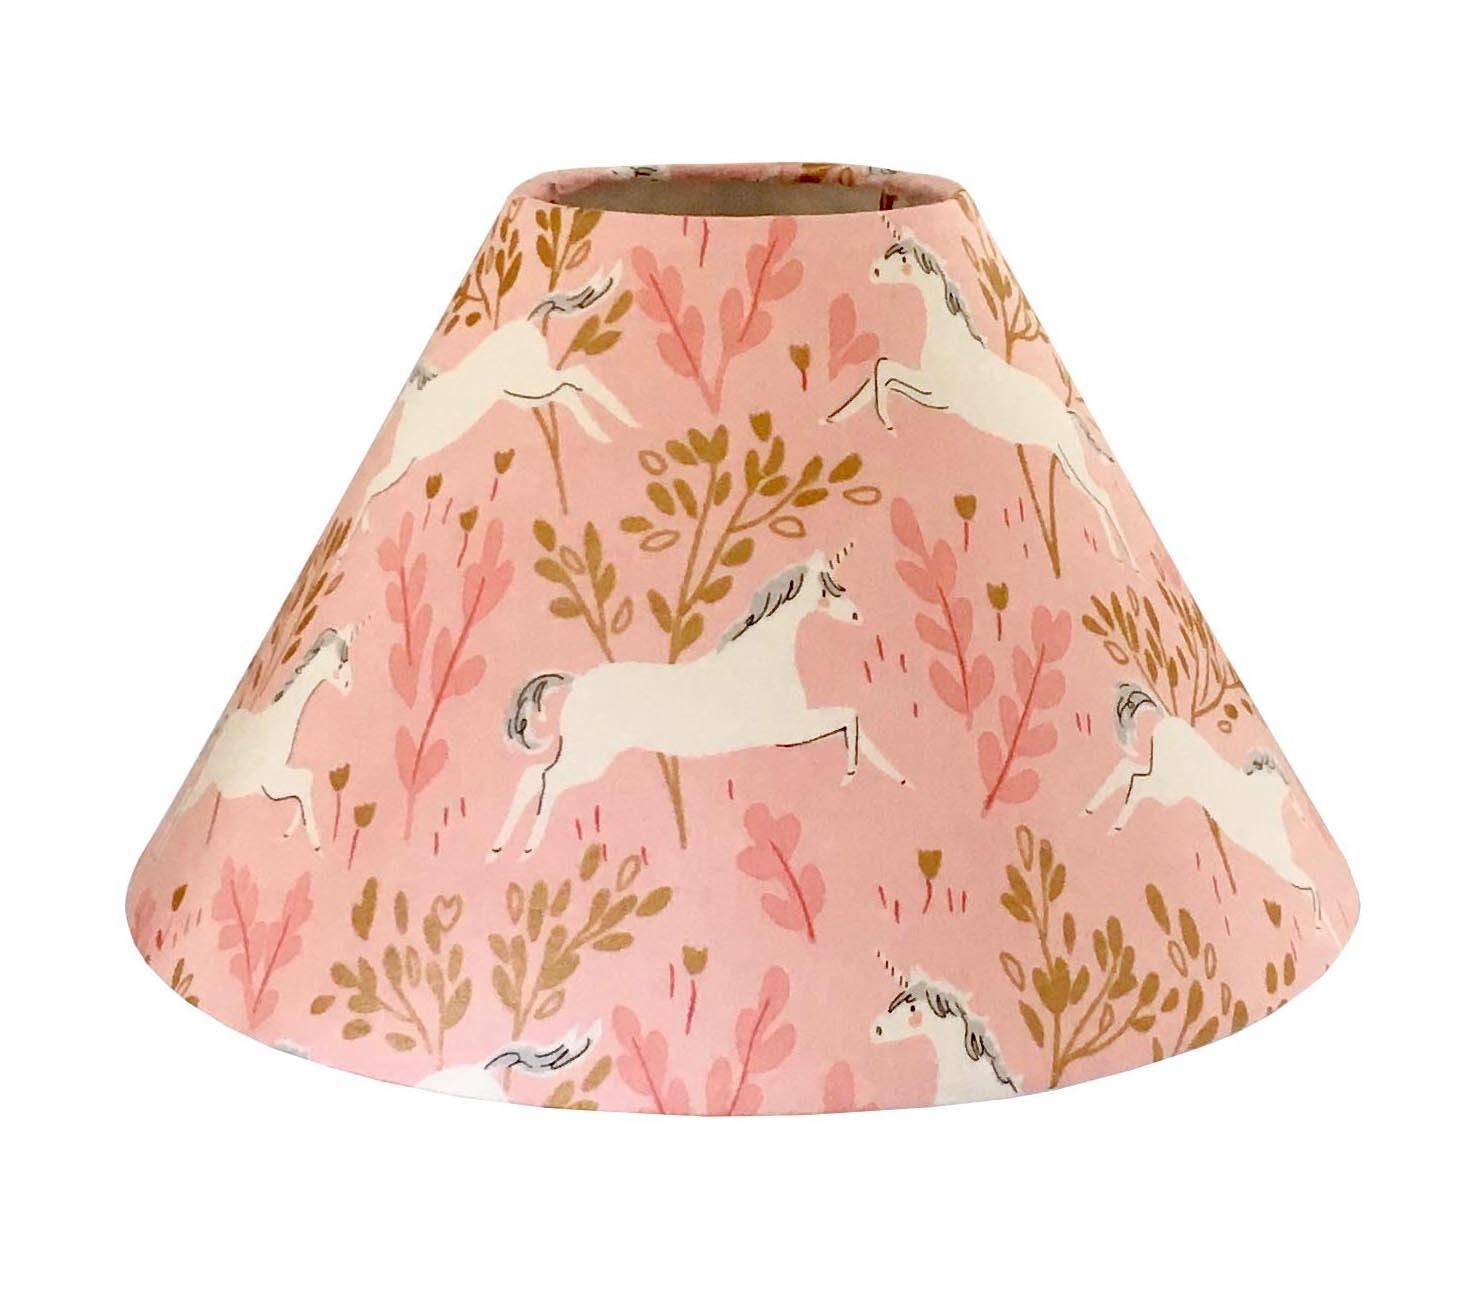 Magic Unicorn Lampshade Metallic Forest Blossom Night Light Girl - Lamp shade for bathroom